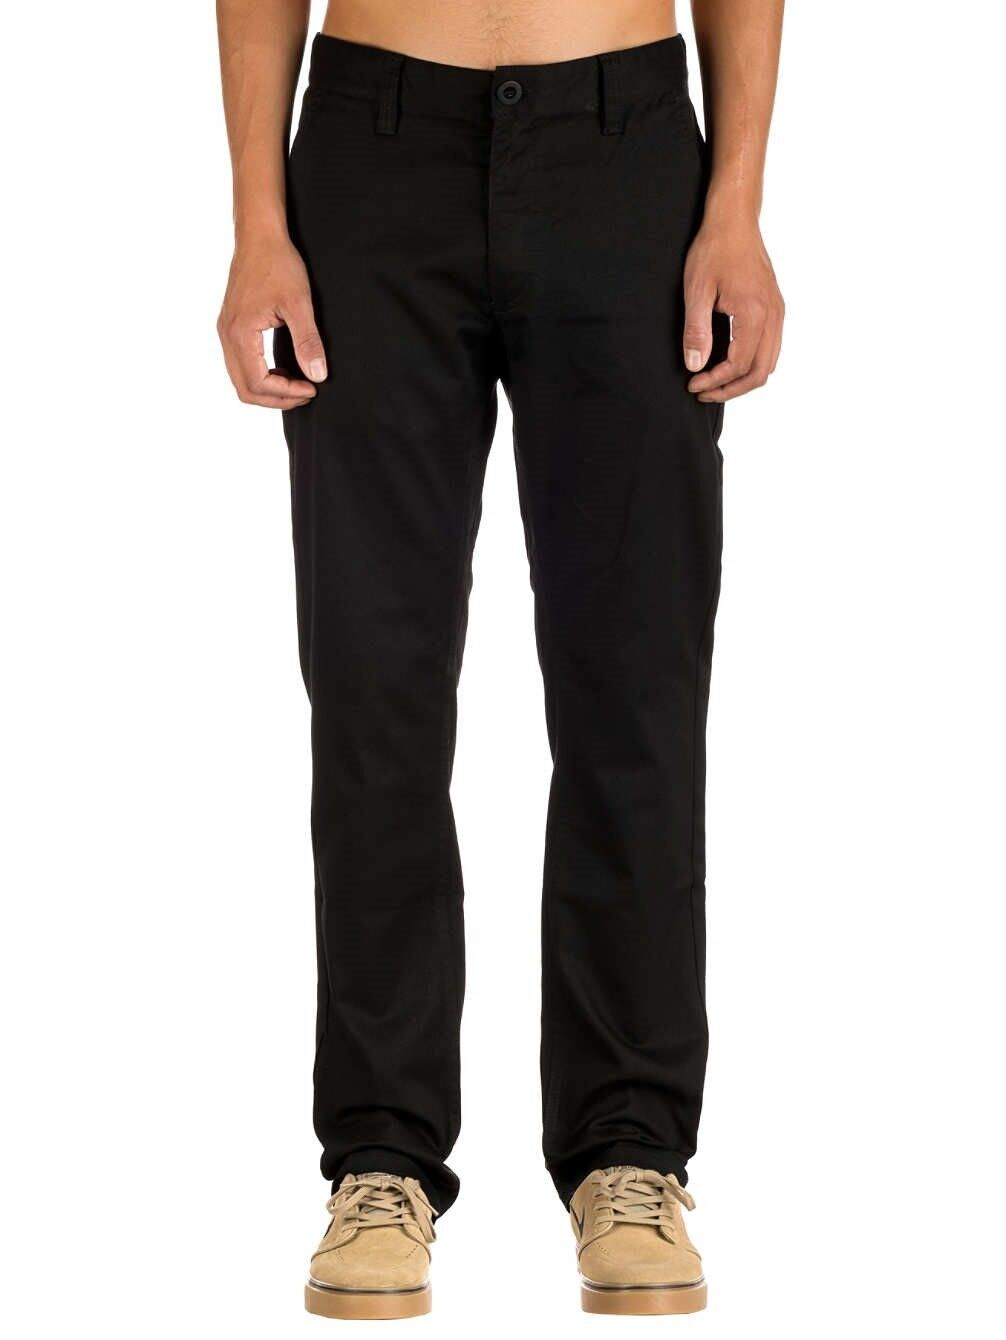 Brixton Union Union Union Chino Pant Trousers Loose Fit Ridgid Classic schwarz 32W 32L BNWT c9bb2e